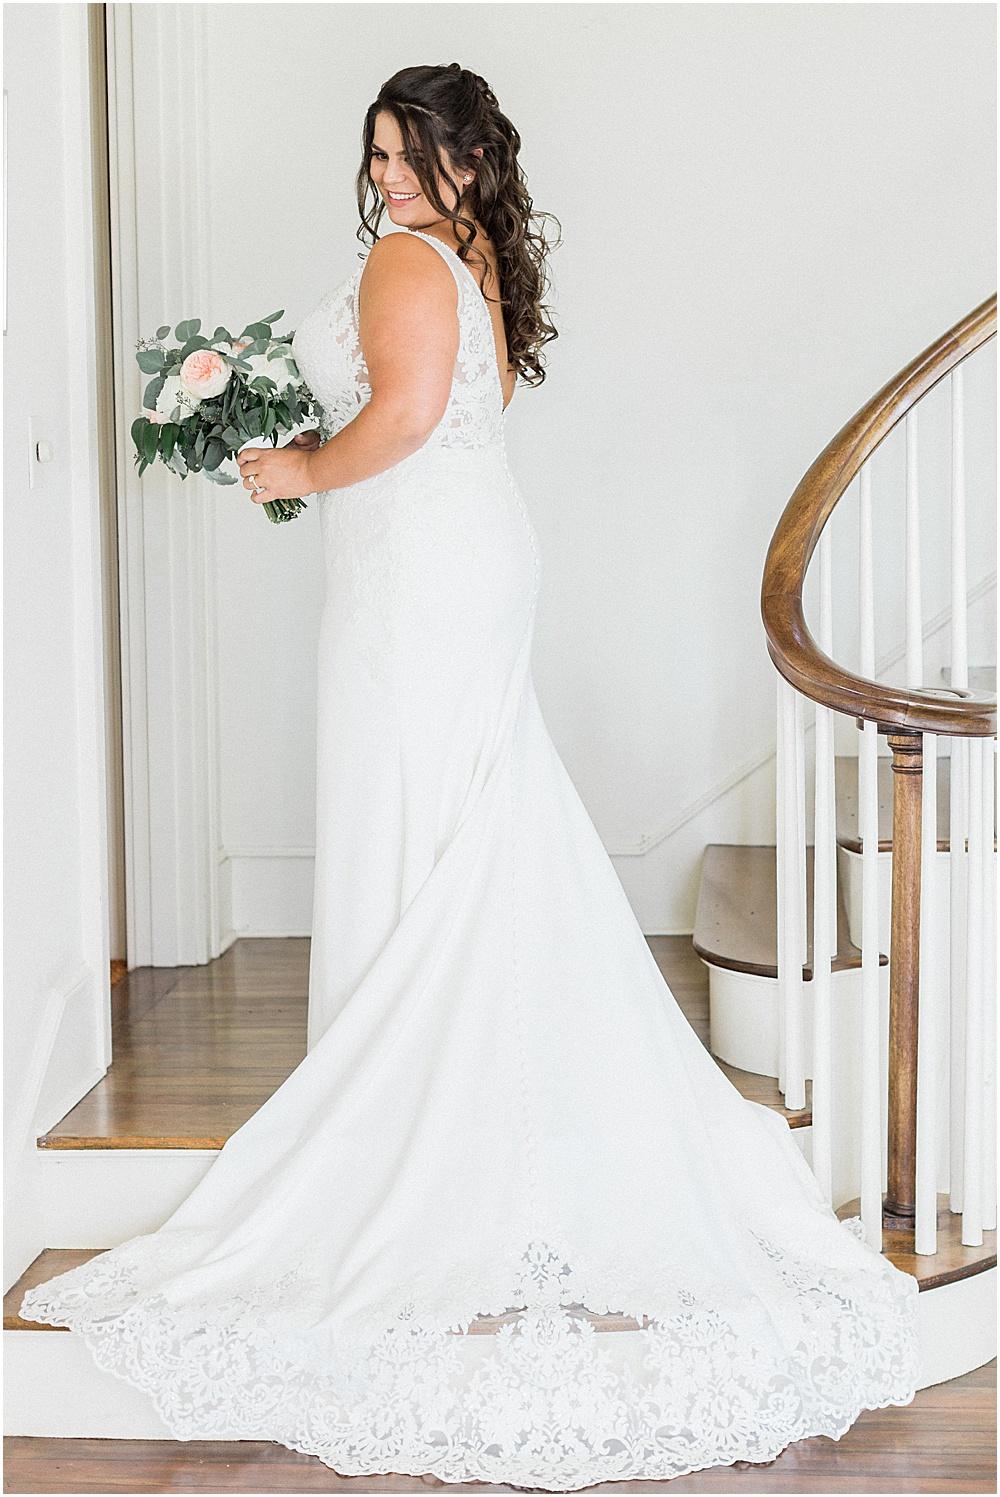 tabor_academy_rebecca_chris_tented_interior_trees_engagement_session_cape_cod_massachusetts_boston_wedding_photographer_meredith_jane_photography_photo_0694.jpg